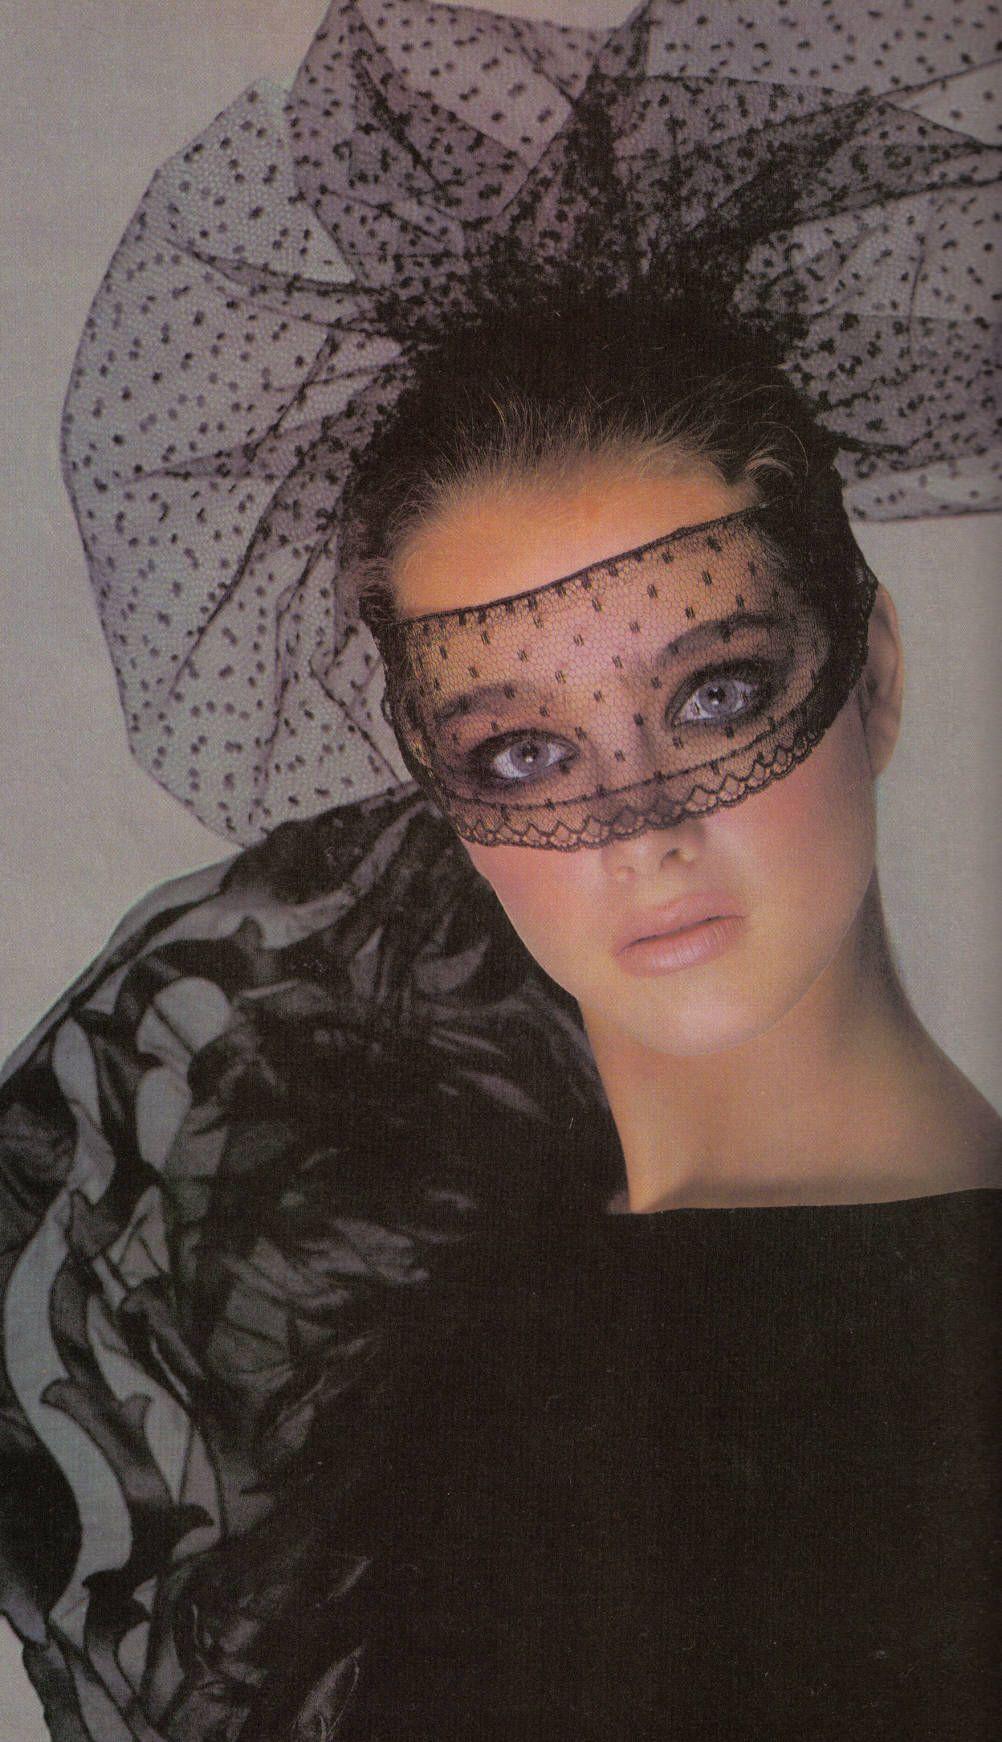 Brooke Shields Vogue | 80's Touch | va-nes-sa: vogue 80, brooke shields